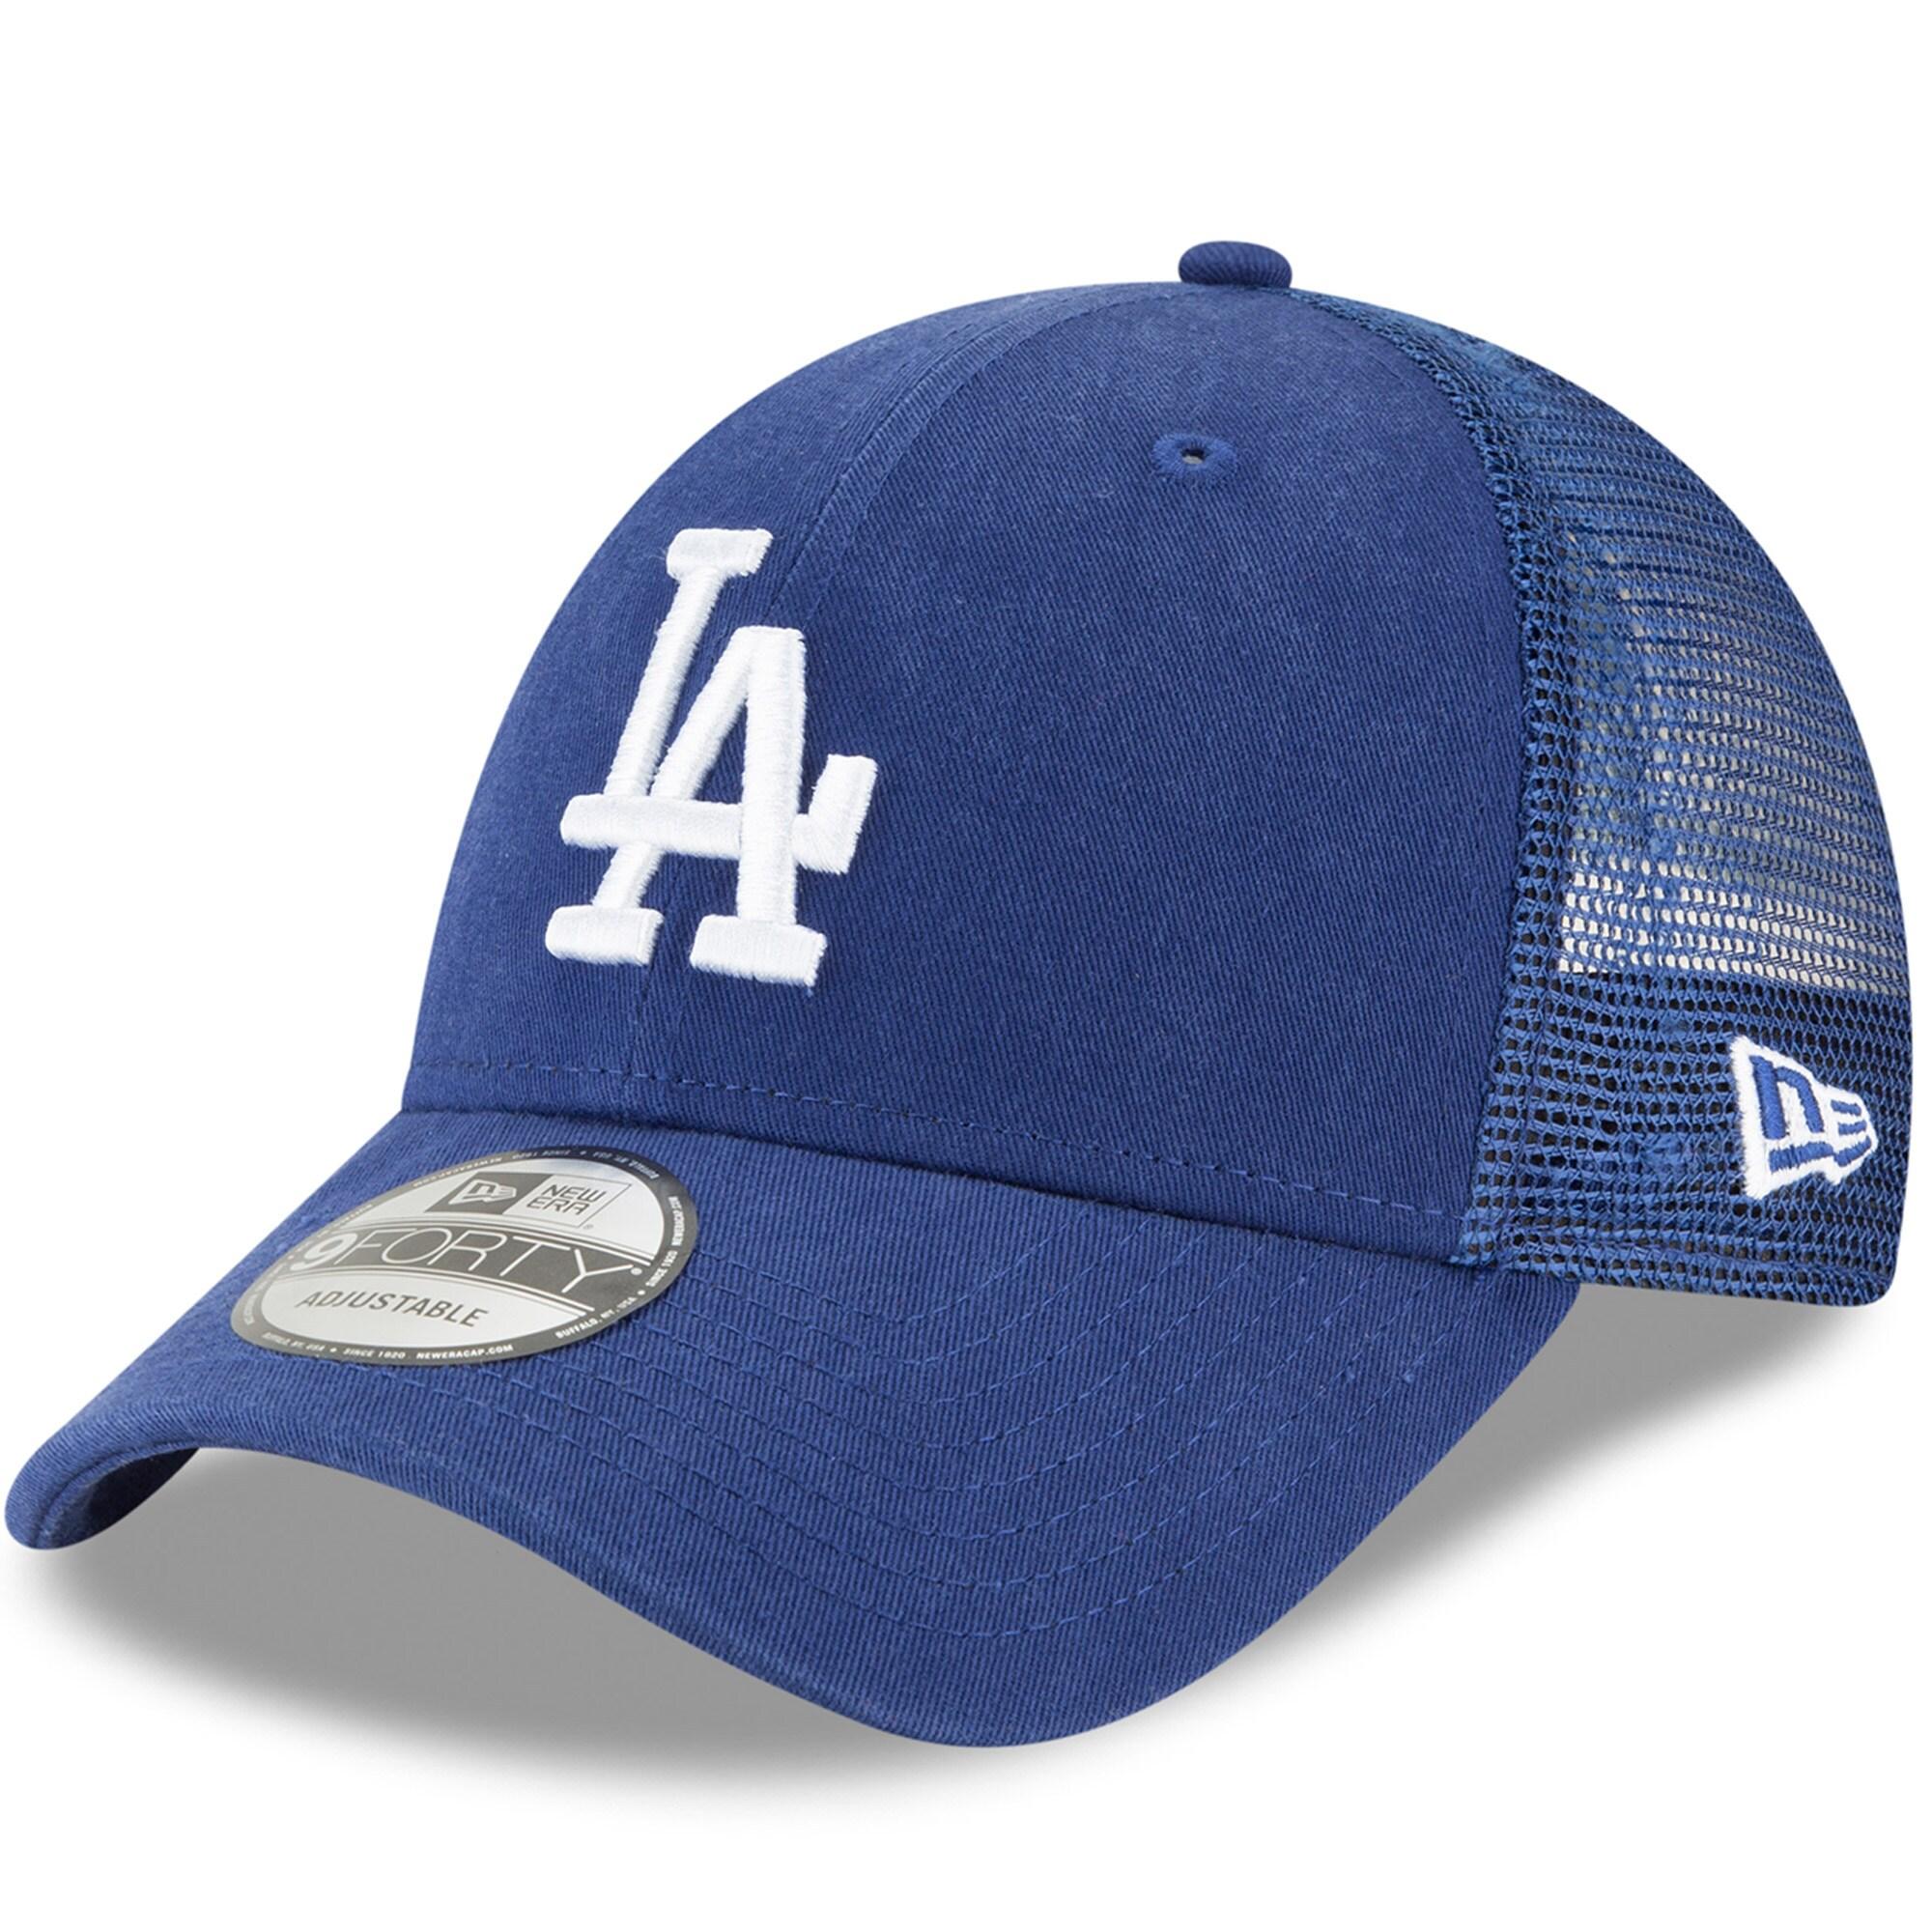 Los Angeles Dodgers New Era Trucker 9FORTY Adjustable Snapback Hat - Royal